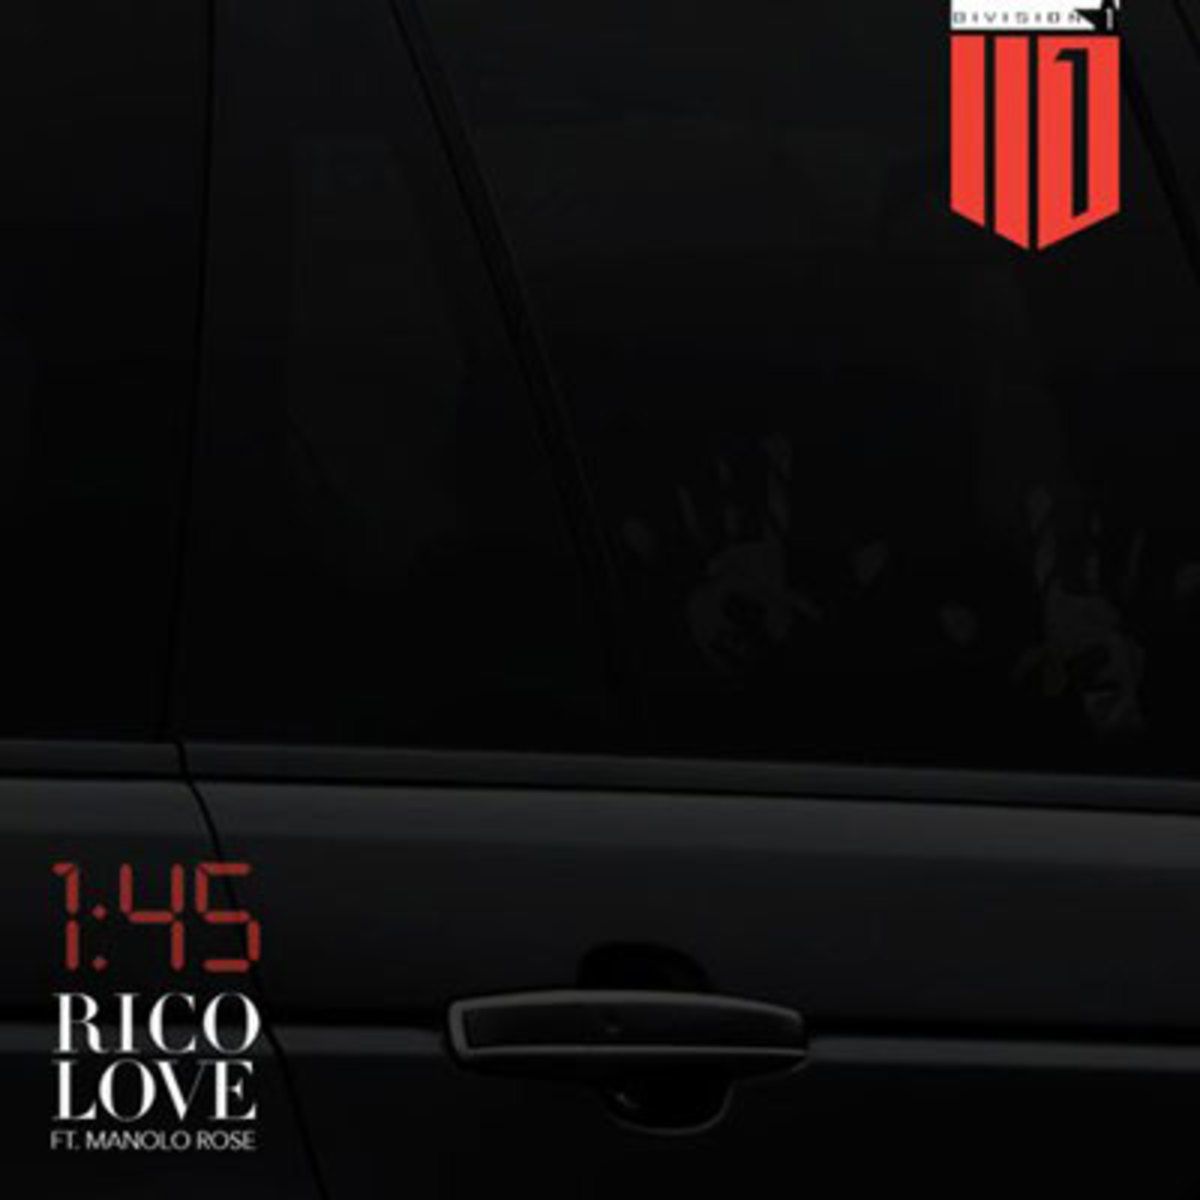 ricolove-145.jpg